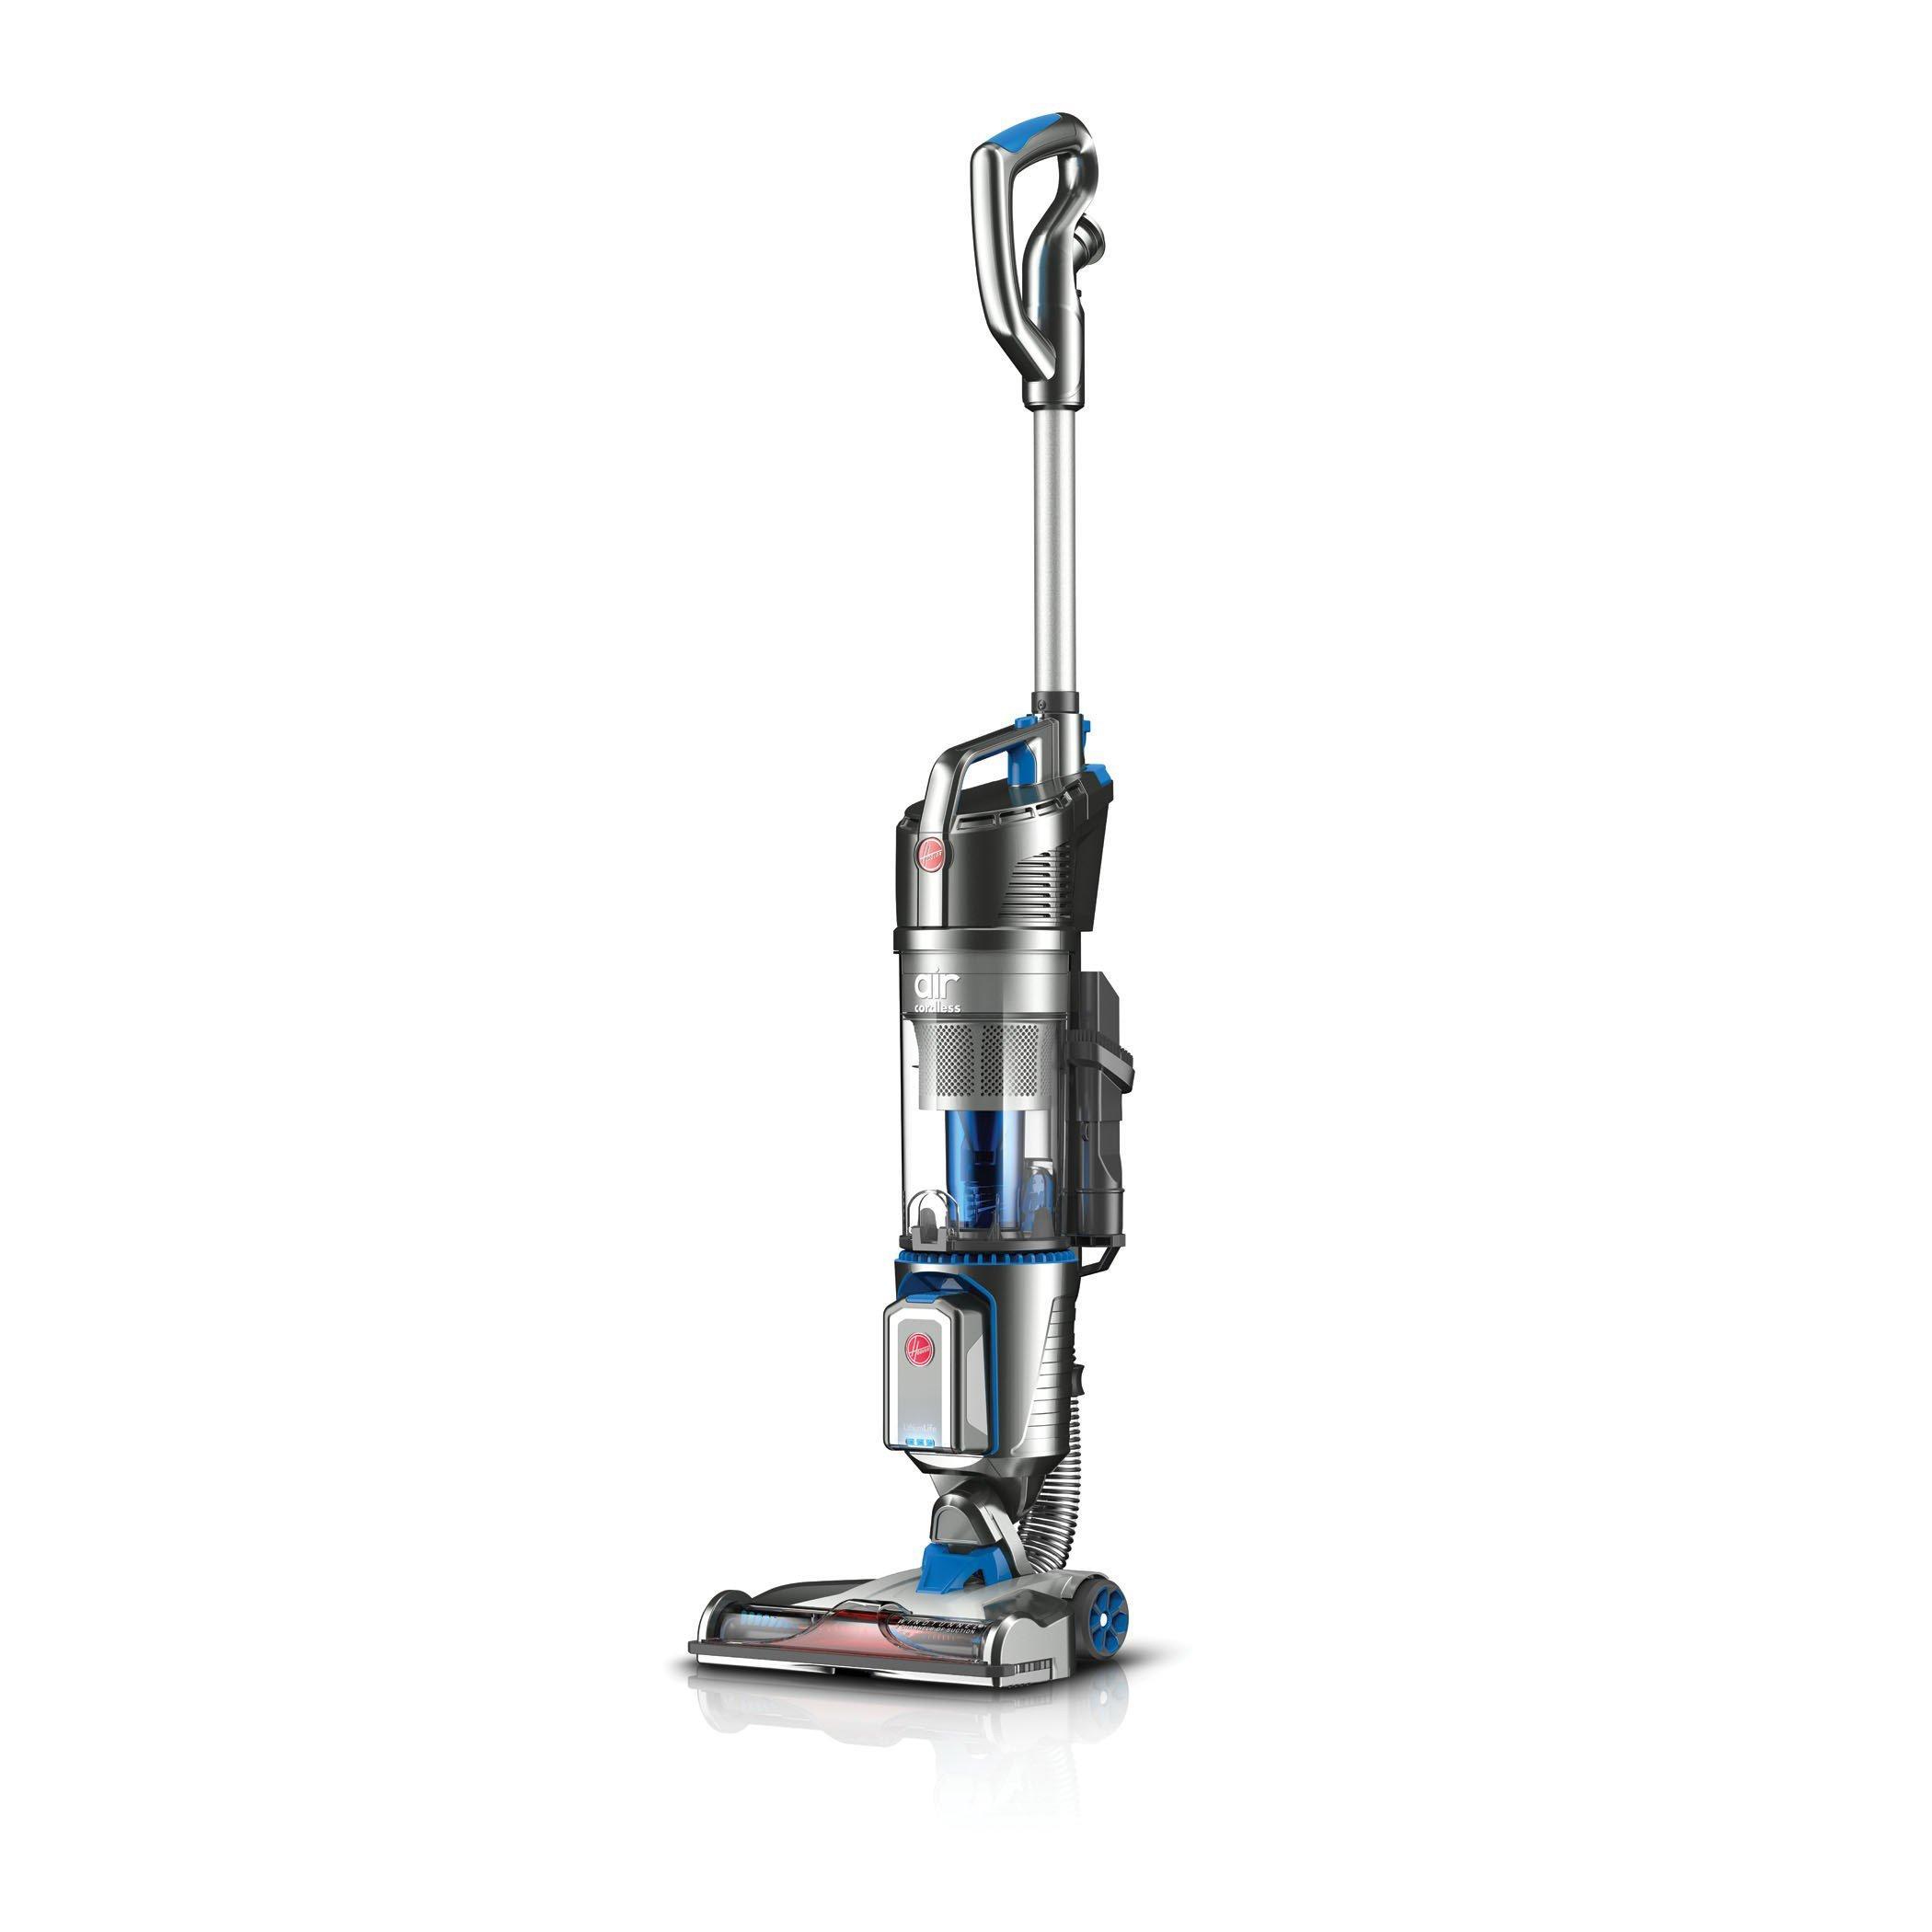 Air Cordless Upright Vacuum